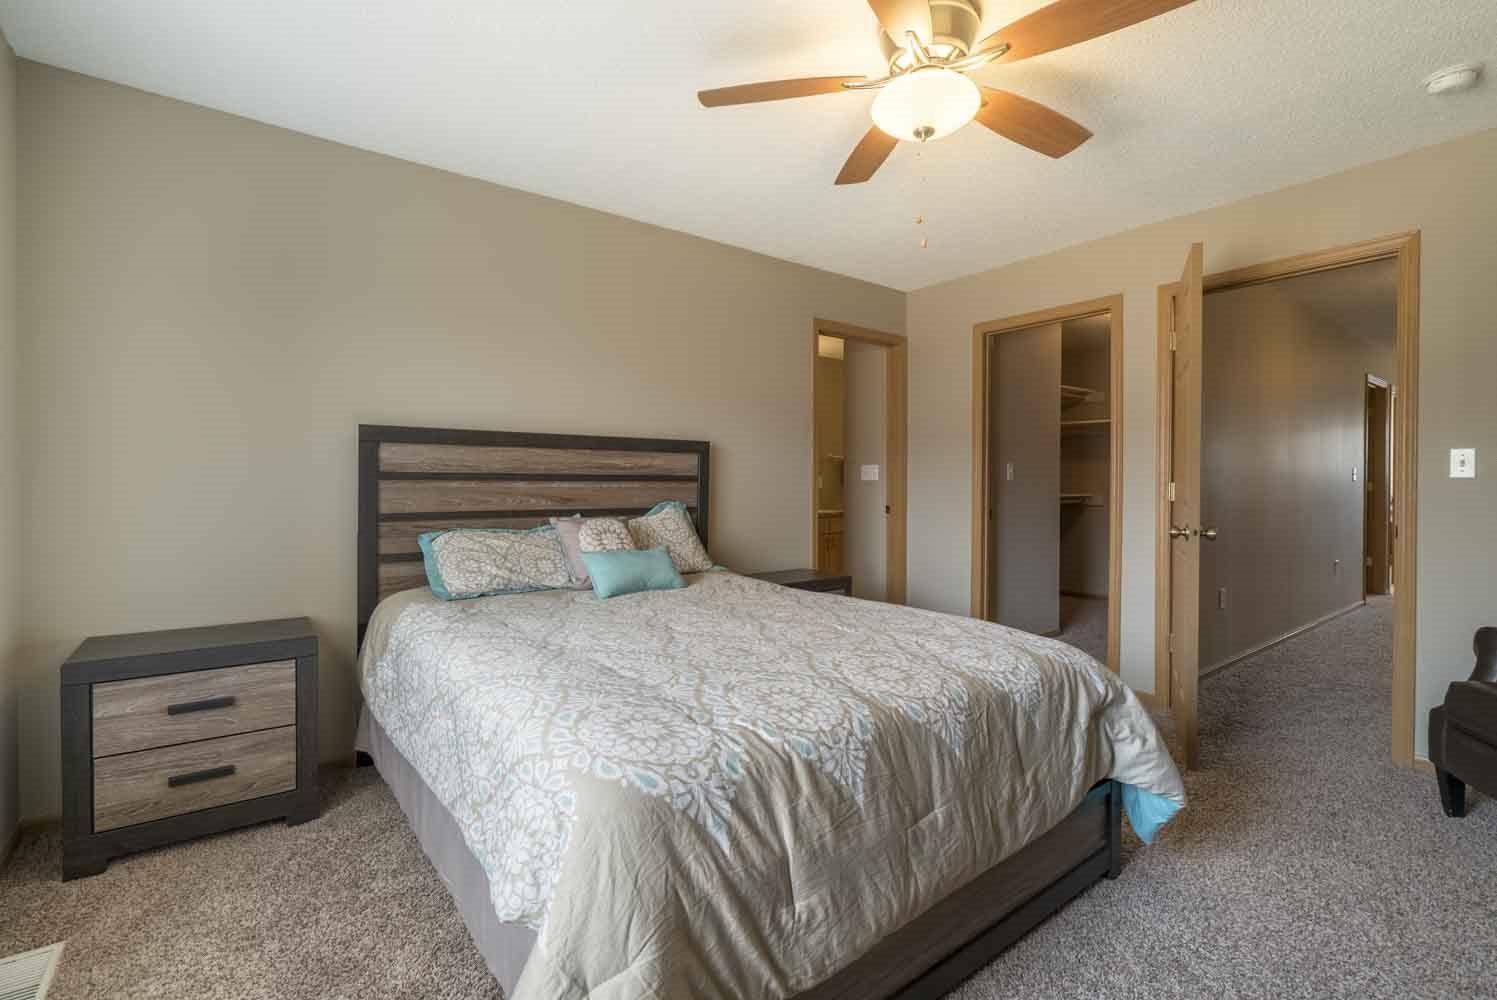 Master bedroom with walk-in closet and master bath at Southwind Villas in southwest Omaha in La Vista, NE, 68128